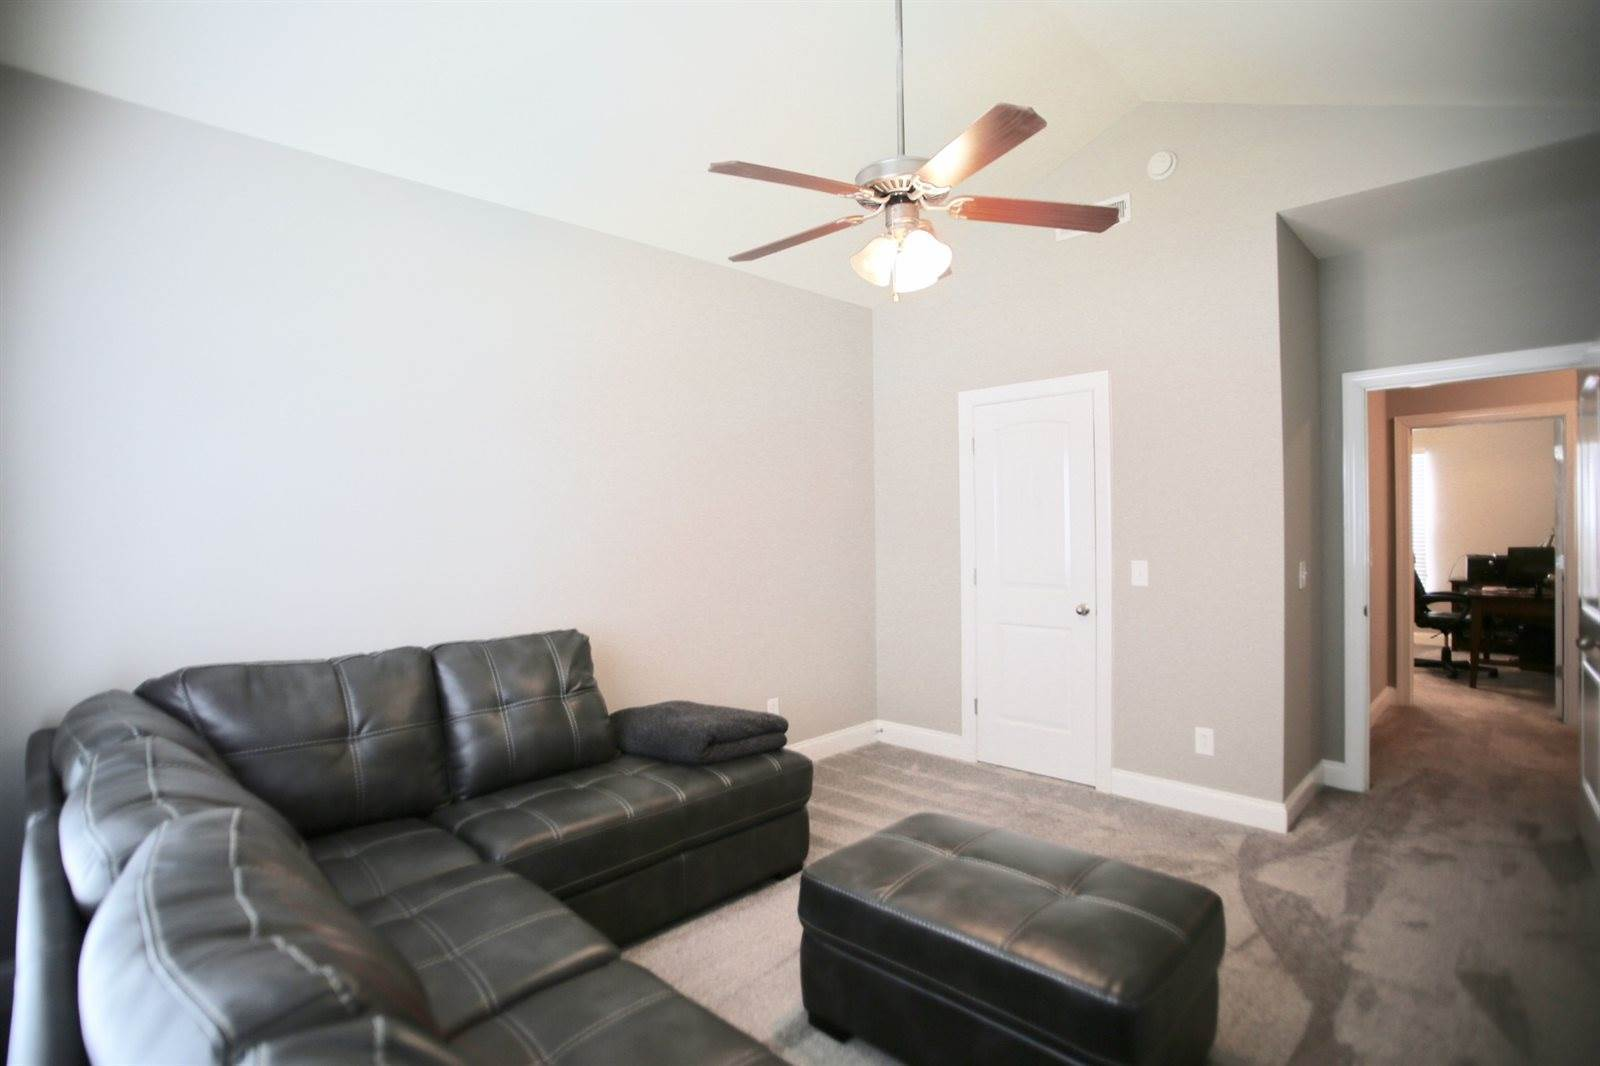 346 Rowlette Cir, Murfreesboro, TN 37127